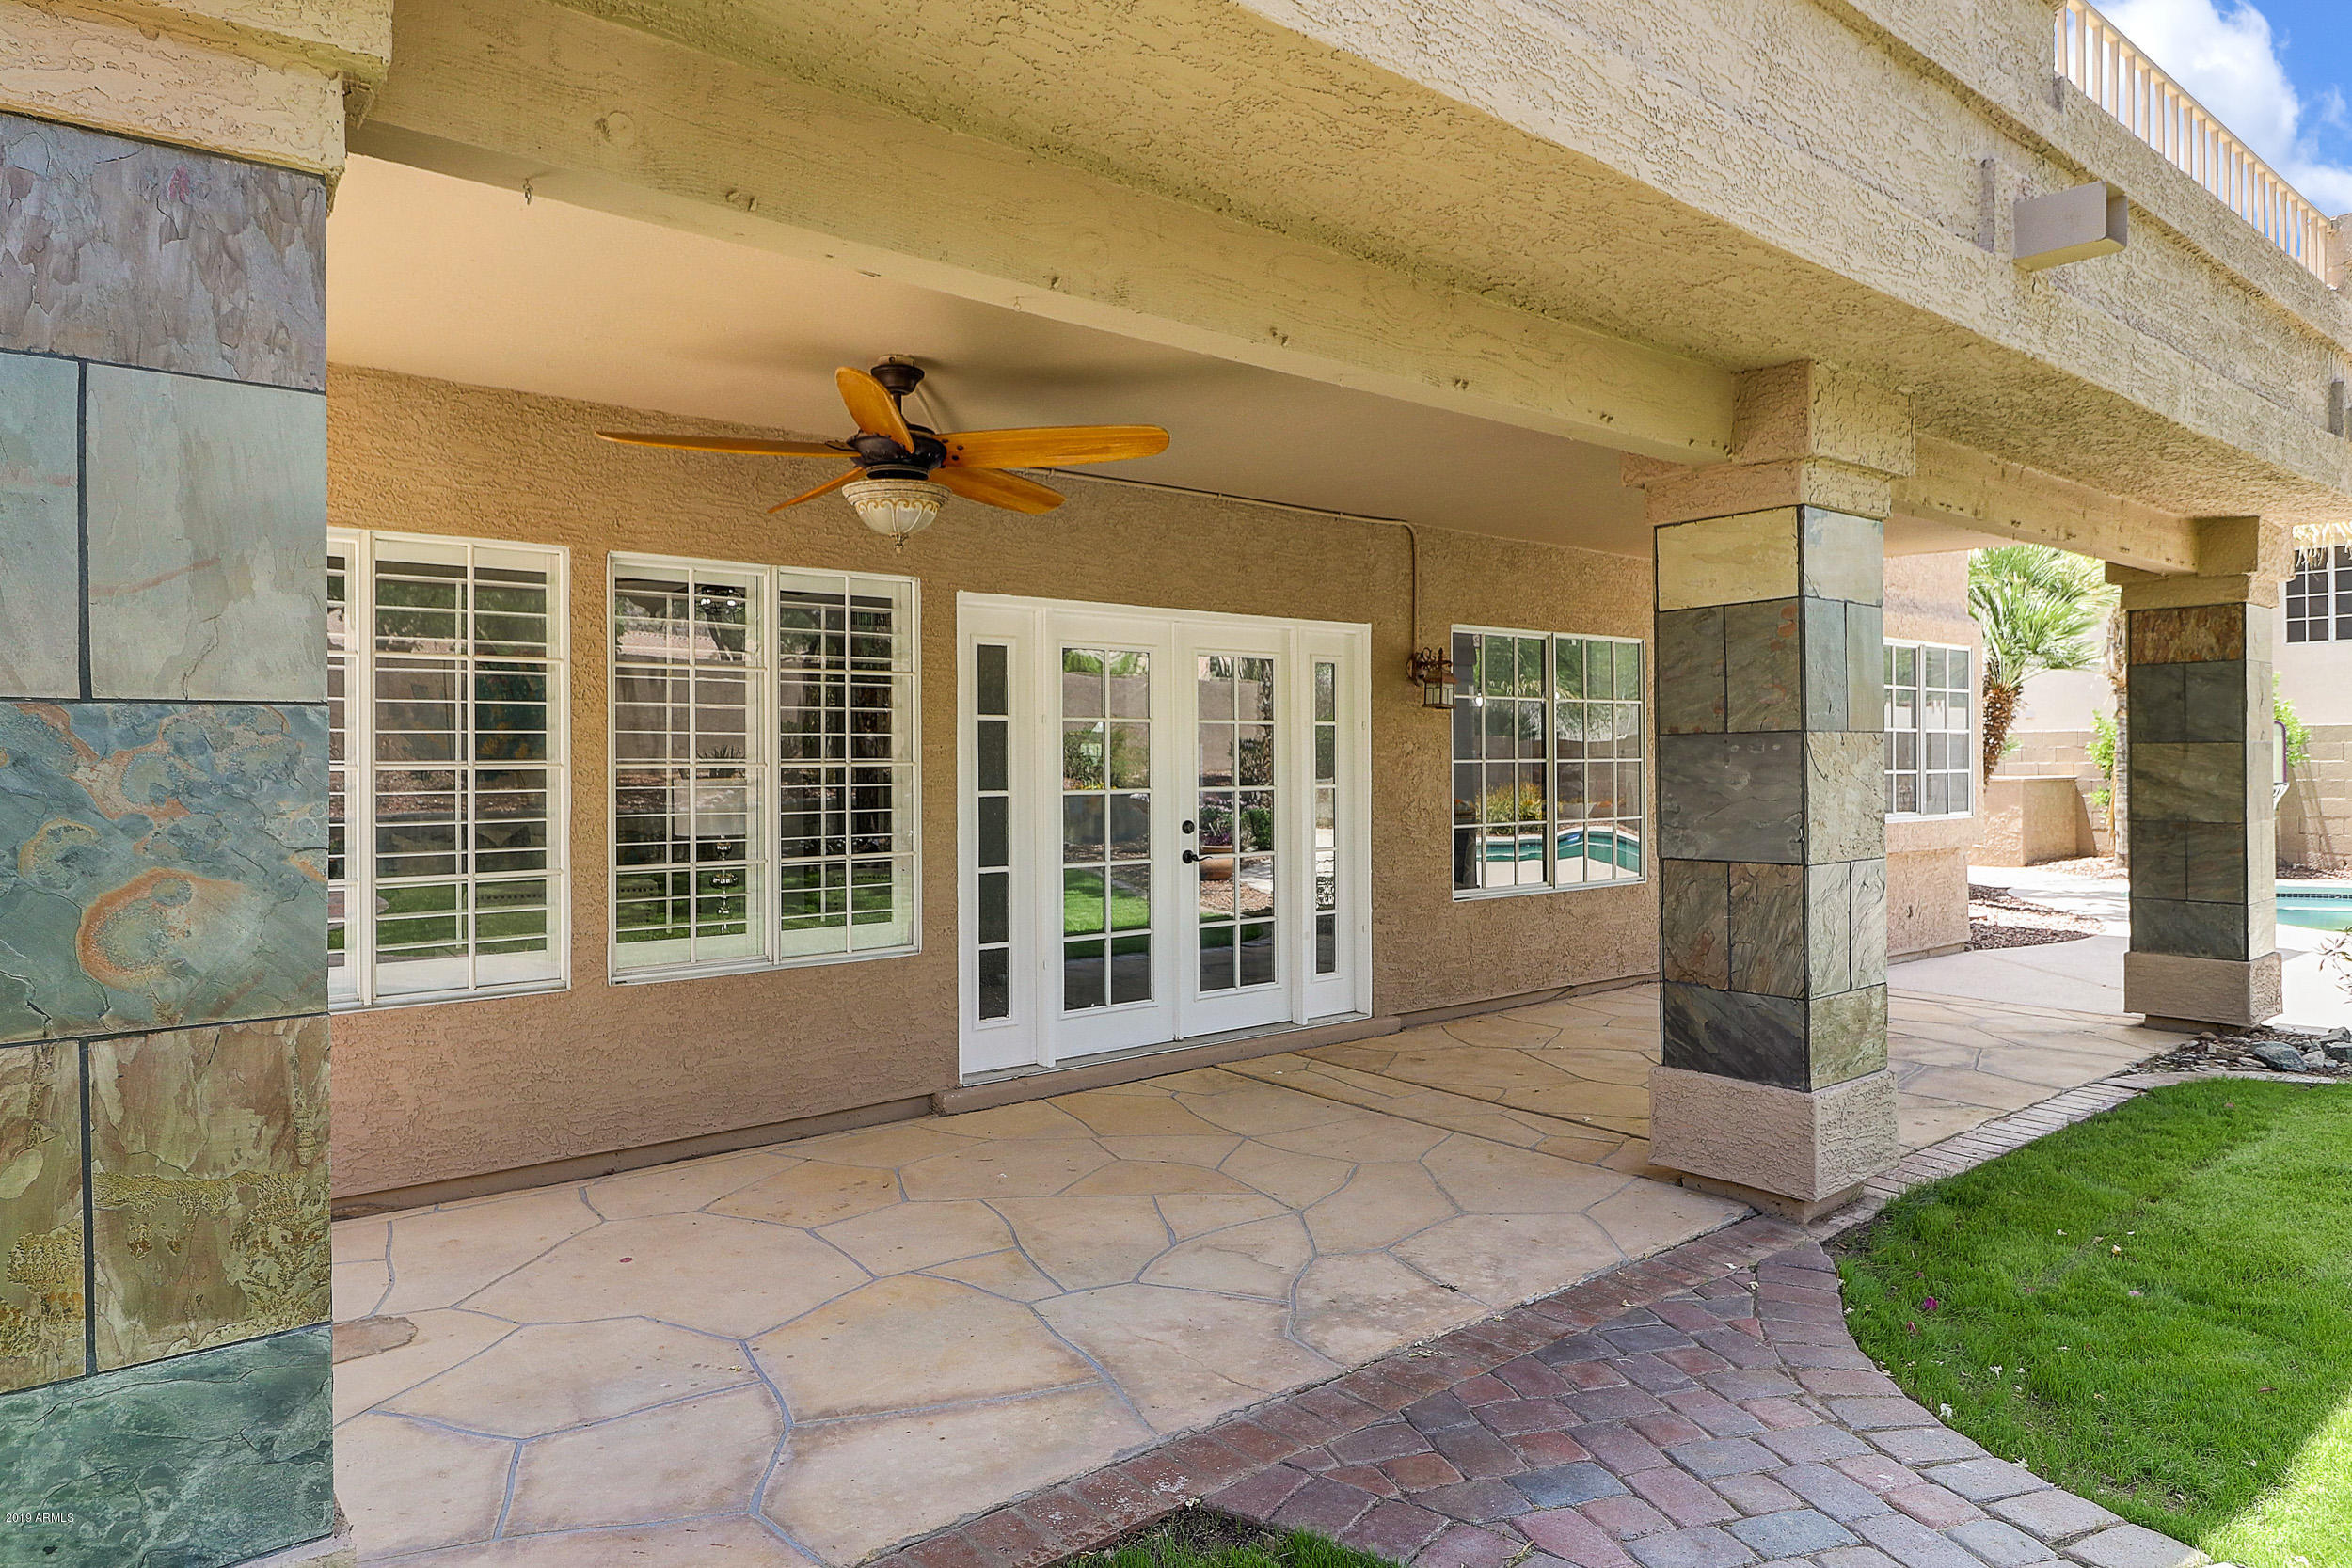 MLS 5930535 1842 E WINDMERE Drive, Phoenix, AZ 85048 Ahwatukee Community AZ Lake Subdivision